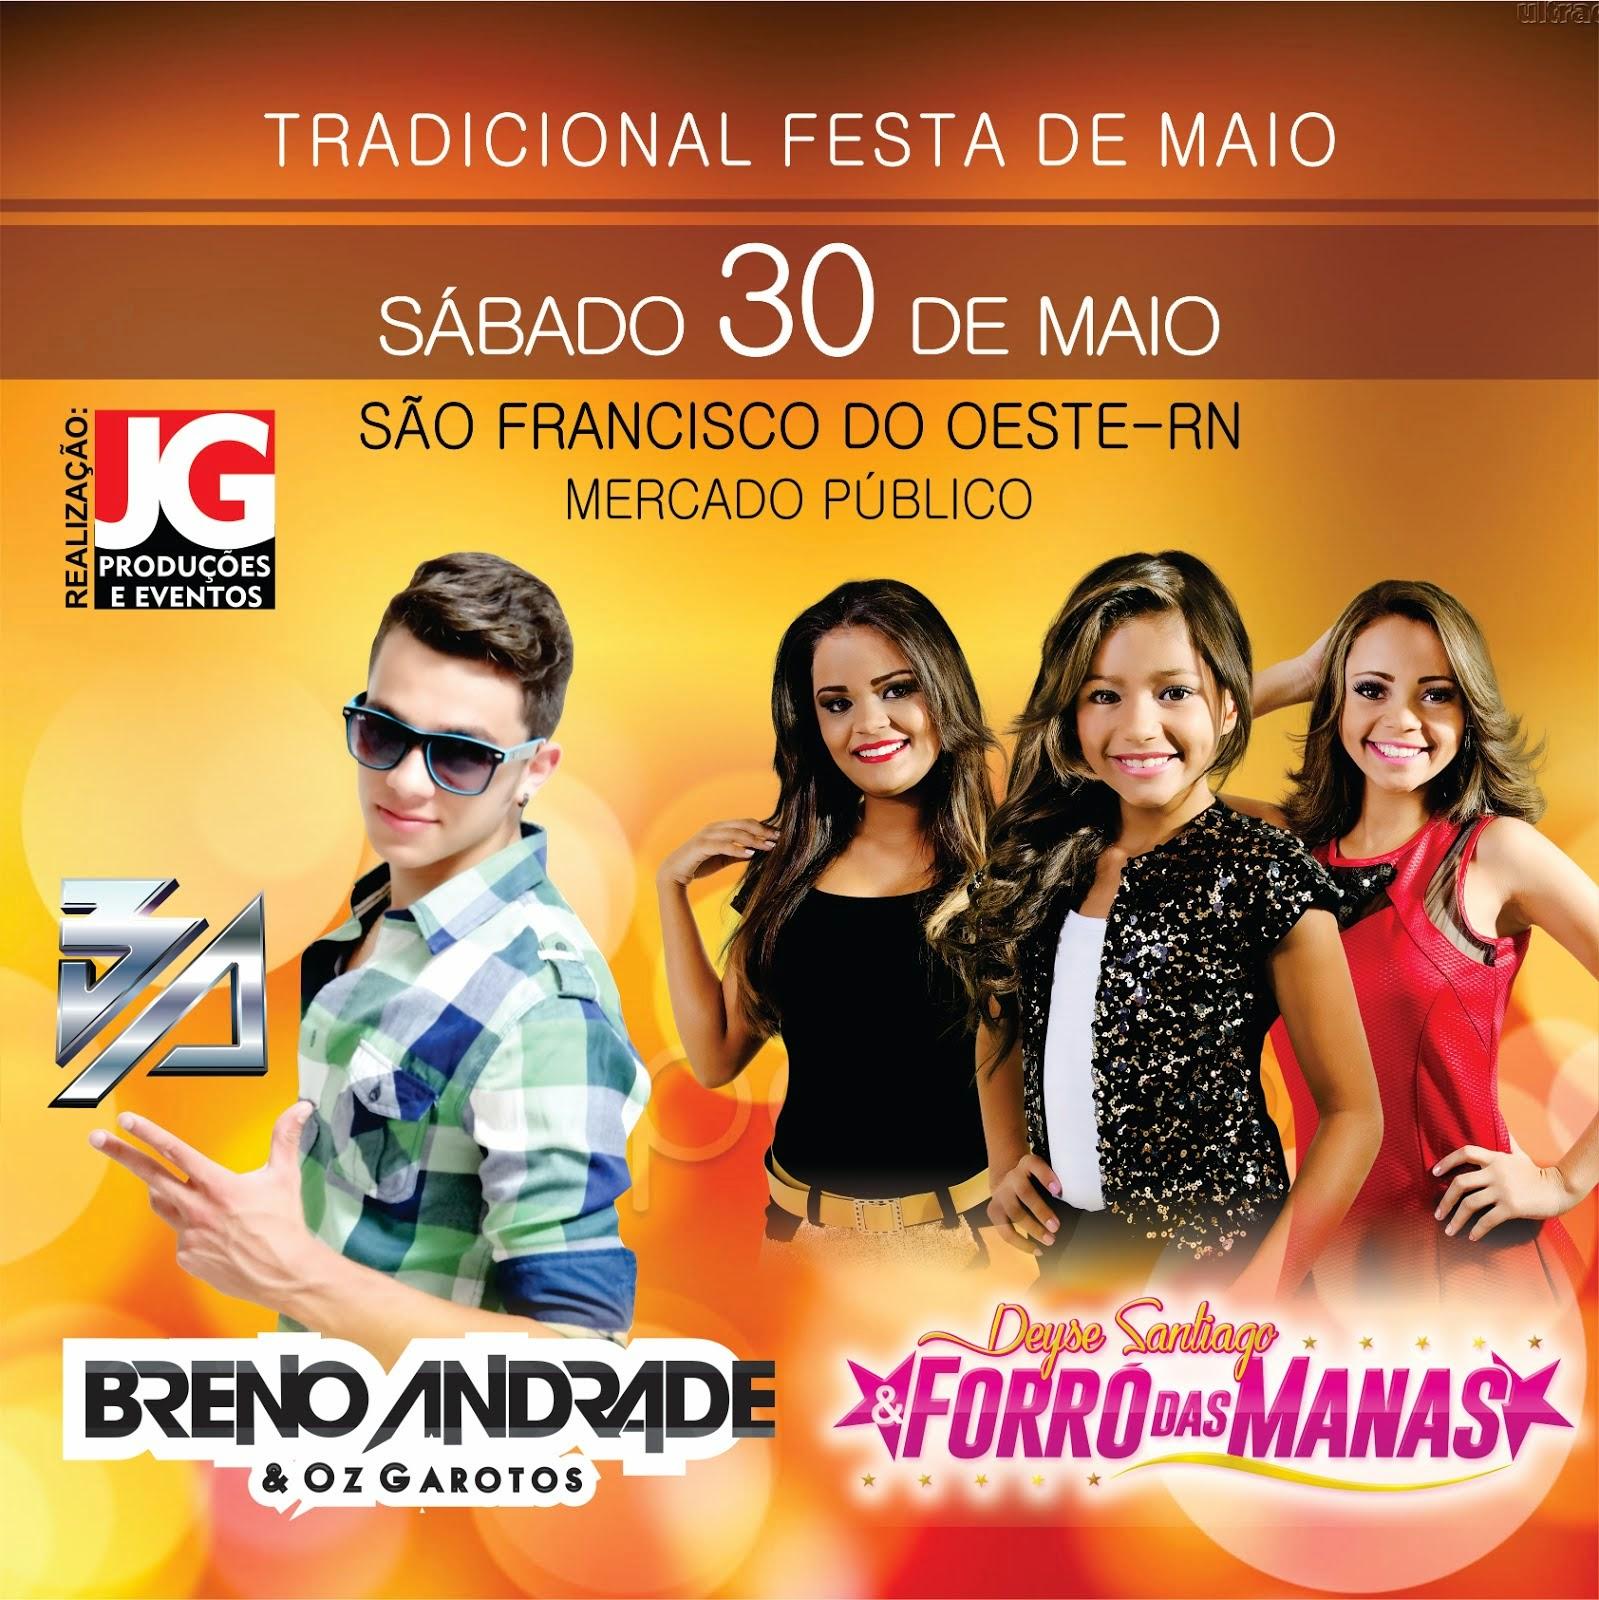 TRADICIONAL FESTA DO 31 DE MAIO!